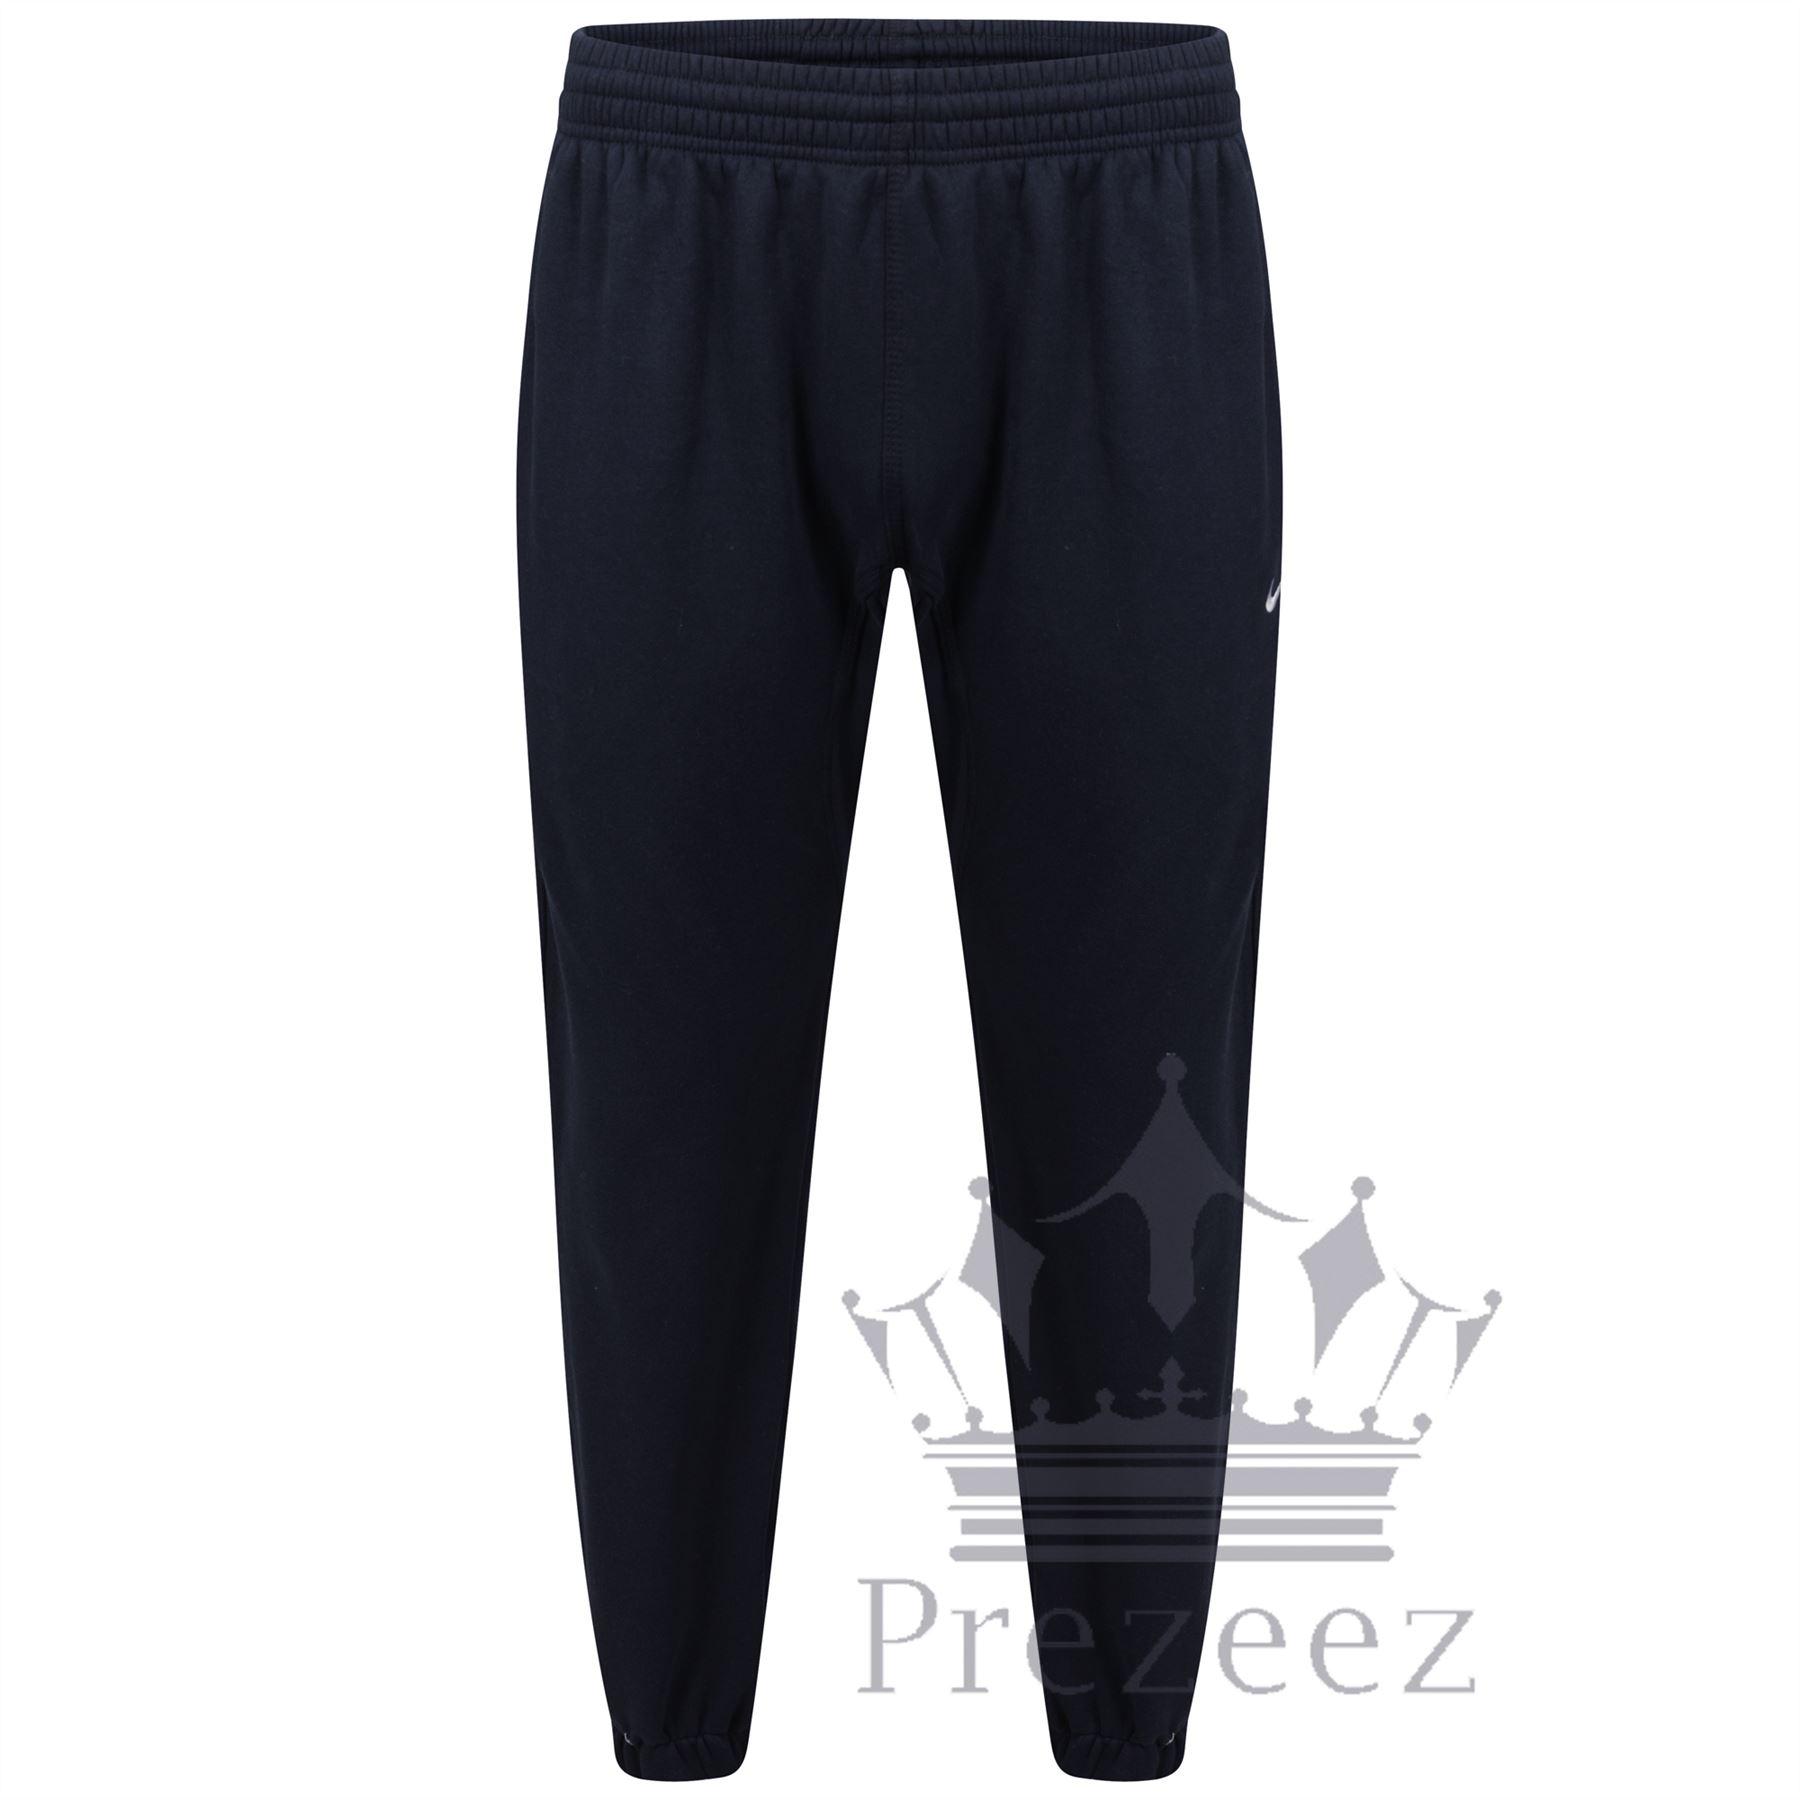 Nike-Joggers-Mens-Jogging-Bottoms-Sweatpants-Small-Medium-Large-XL